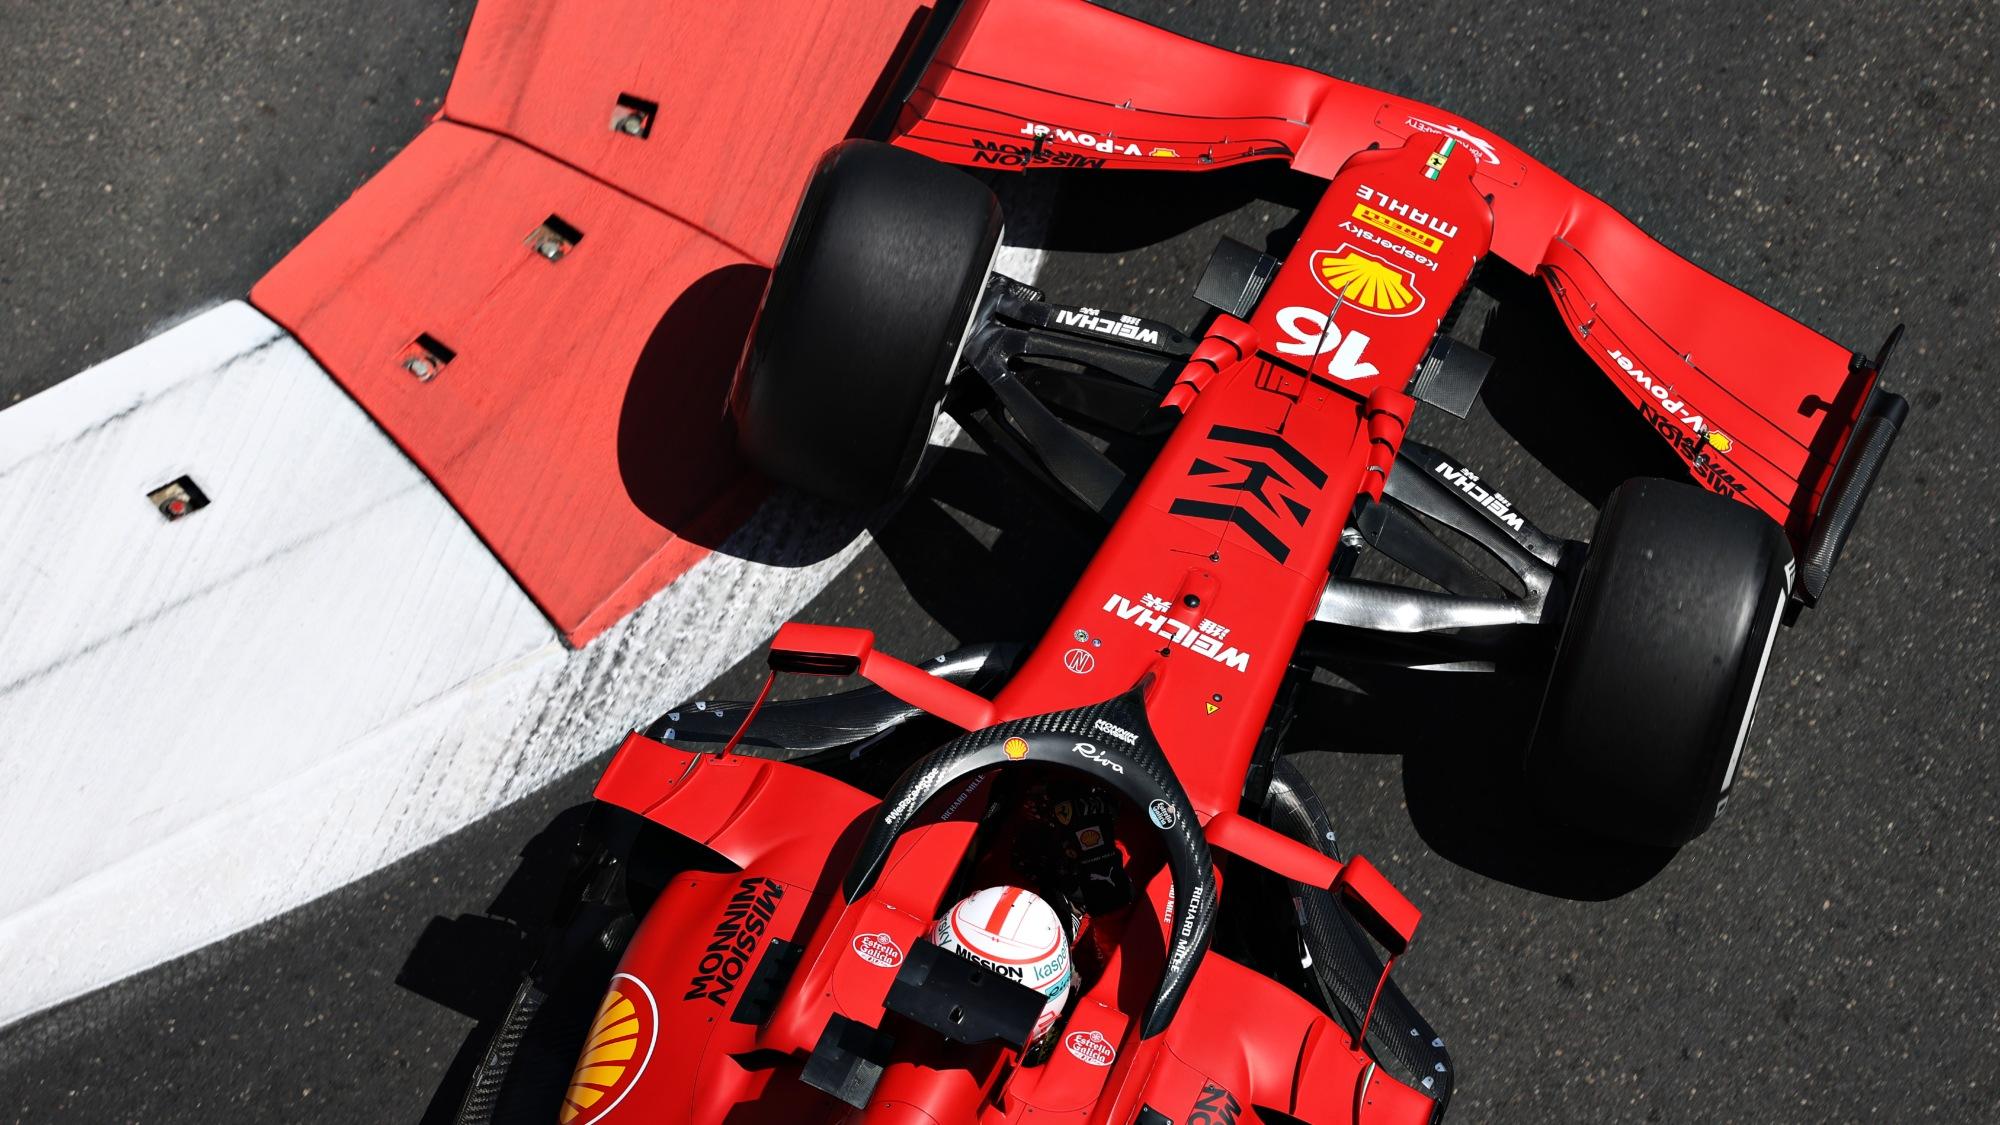 Charles Leclerc, 2021 Baku FP1